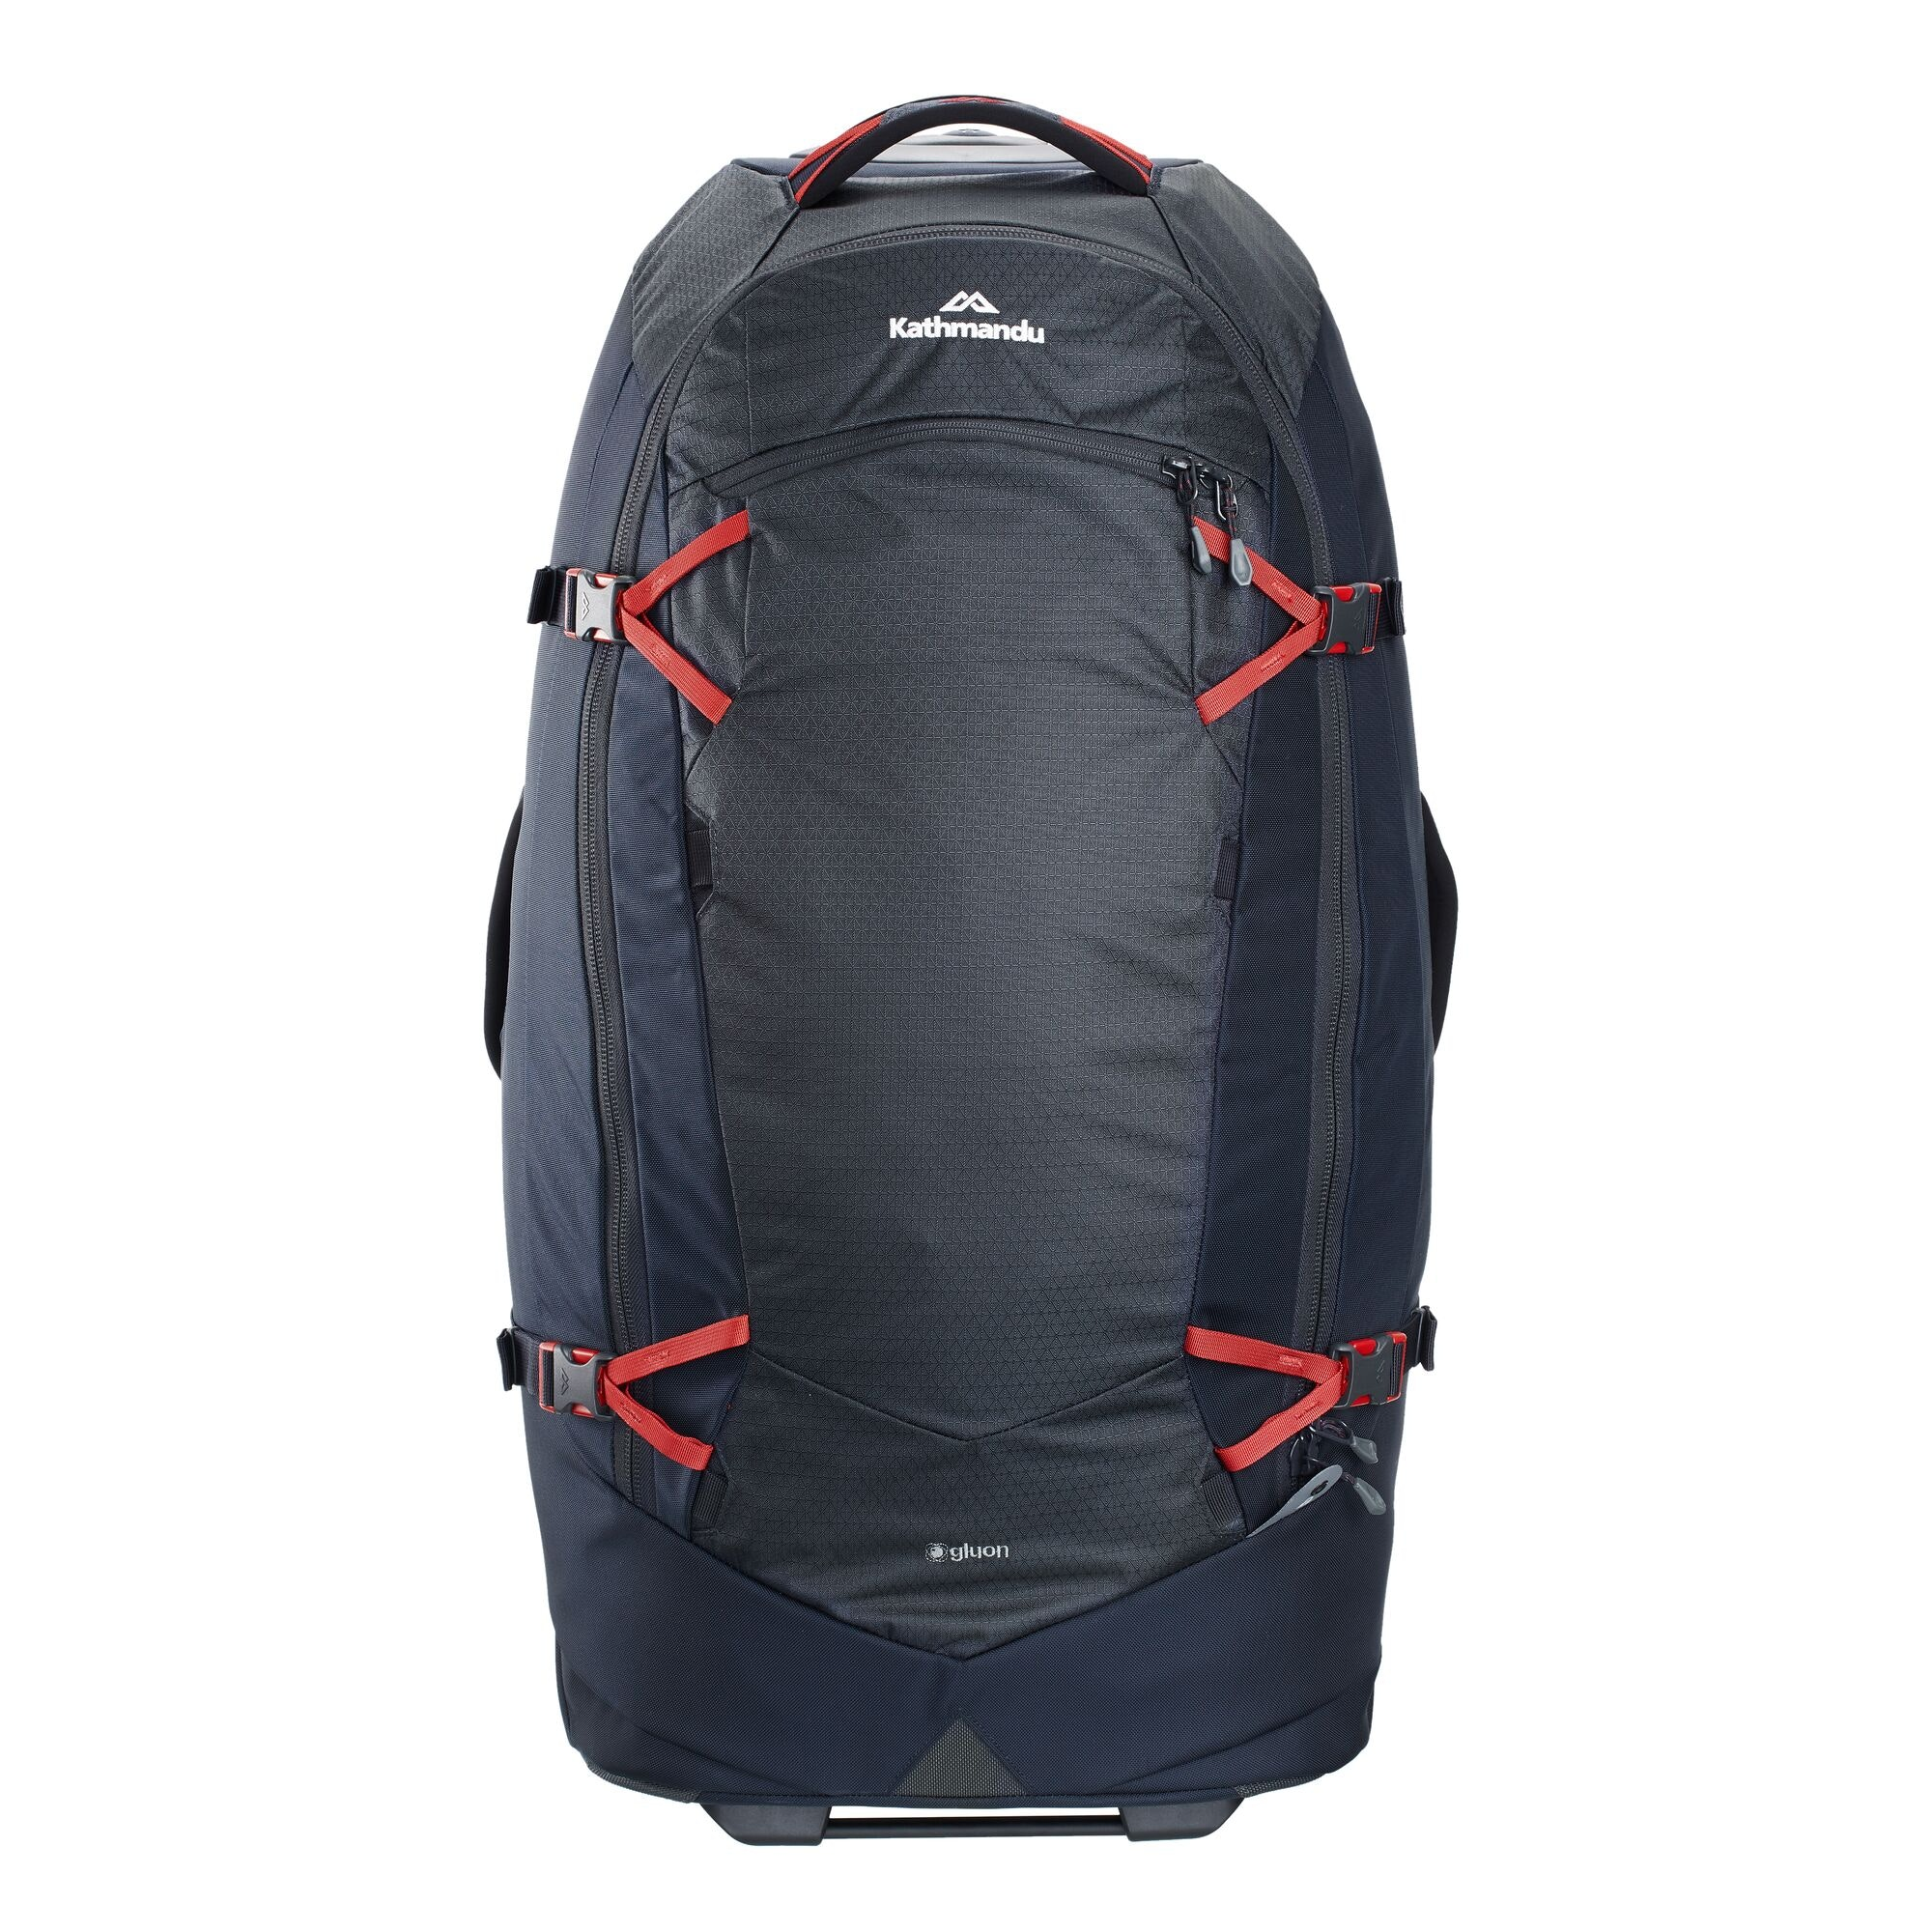 thumbnail 13 - NEW-Kathmandu-Hybrid-70L-Backpack-Wheeled-Handle-Luggage-Bag-Travel-Trolley